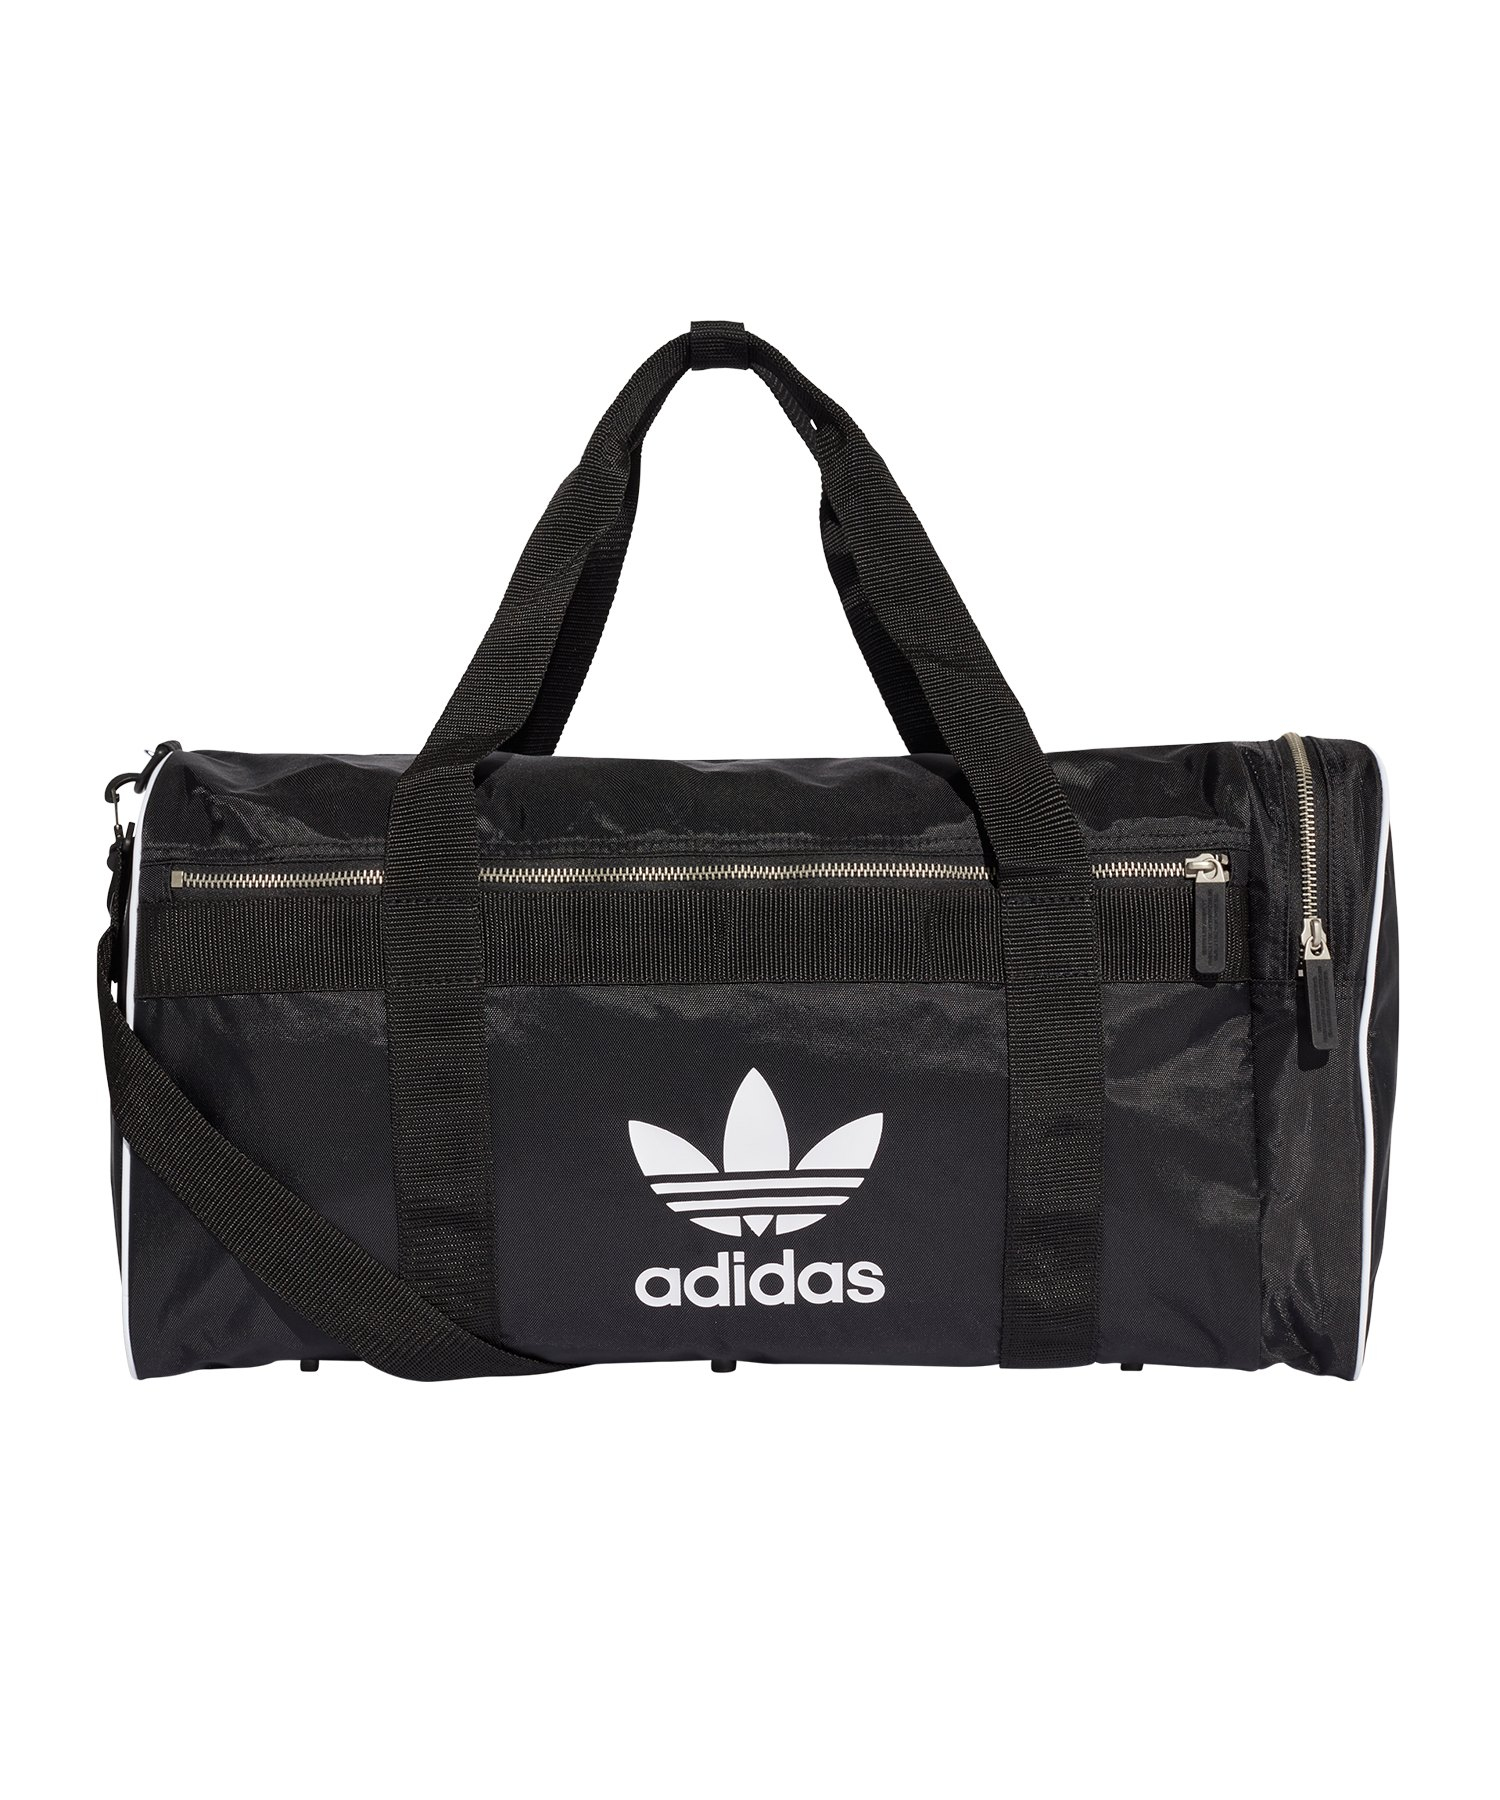 adidas Originals Adicolor Duffle Bag L Schwarz